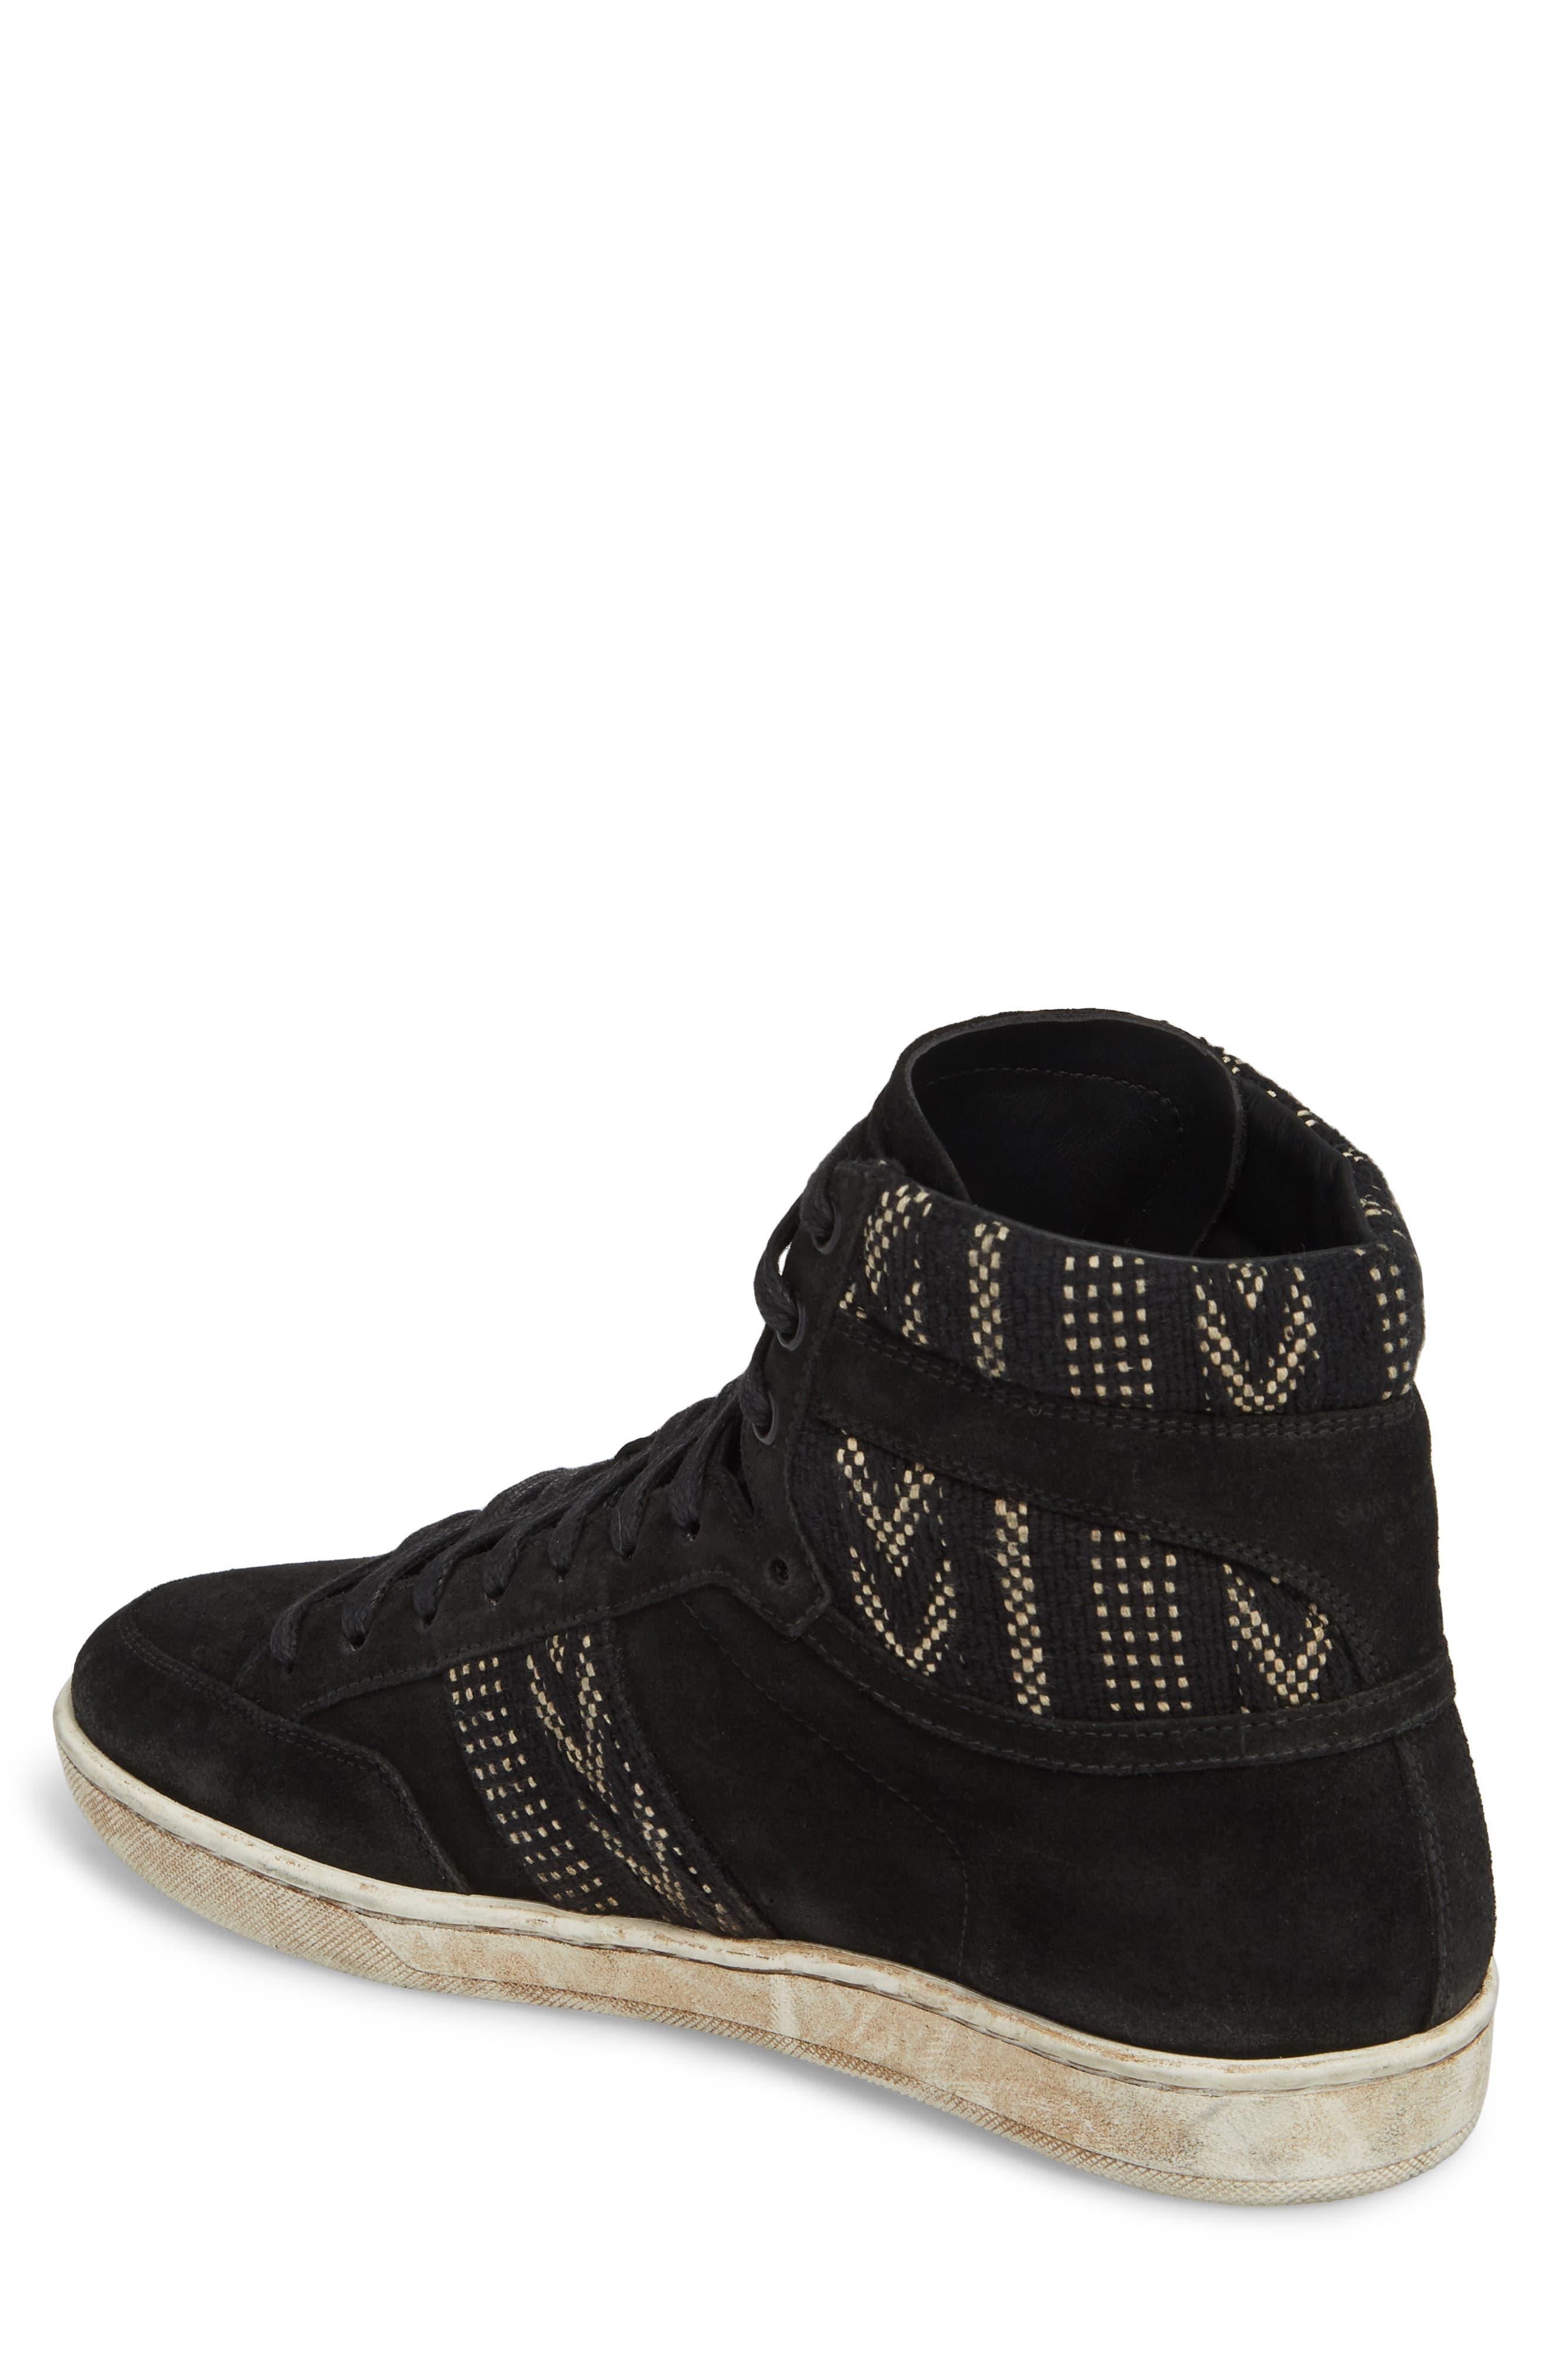 High Top Sneaker,                             Alternate thumbnail 2, color,